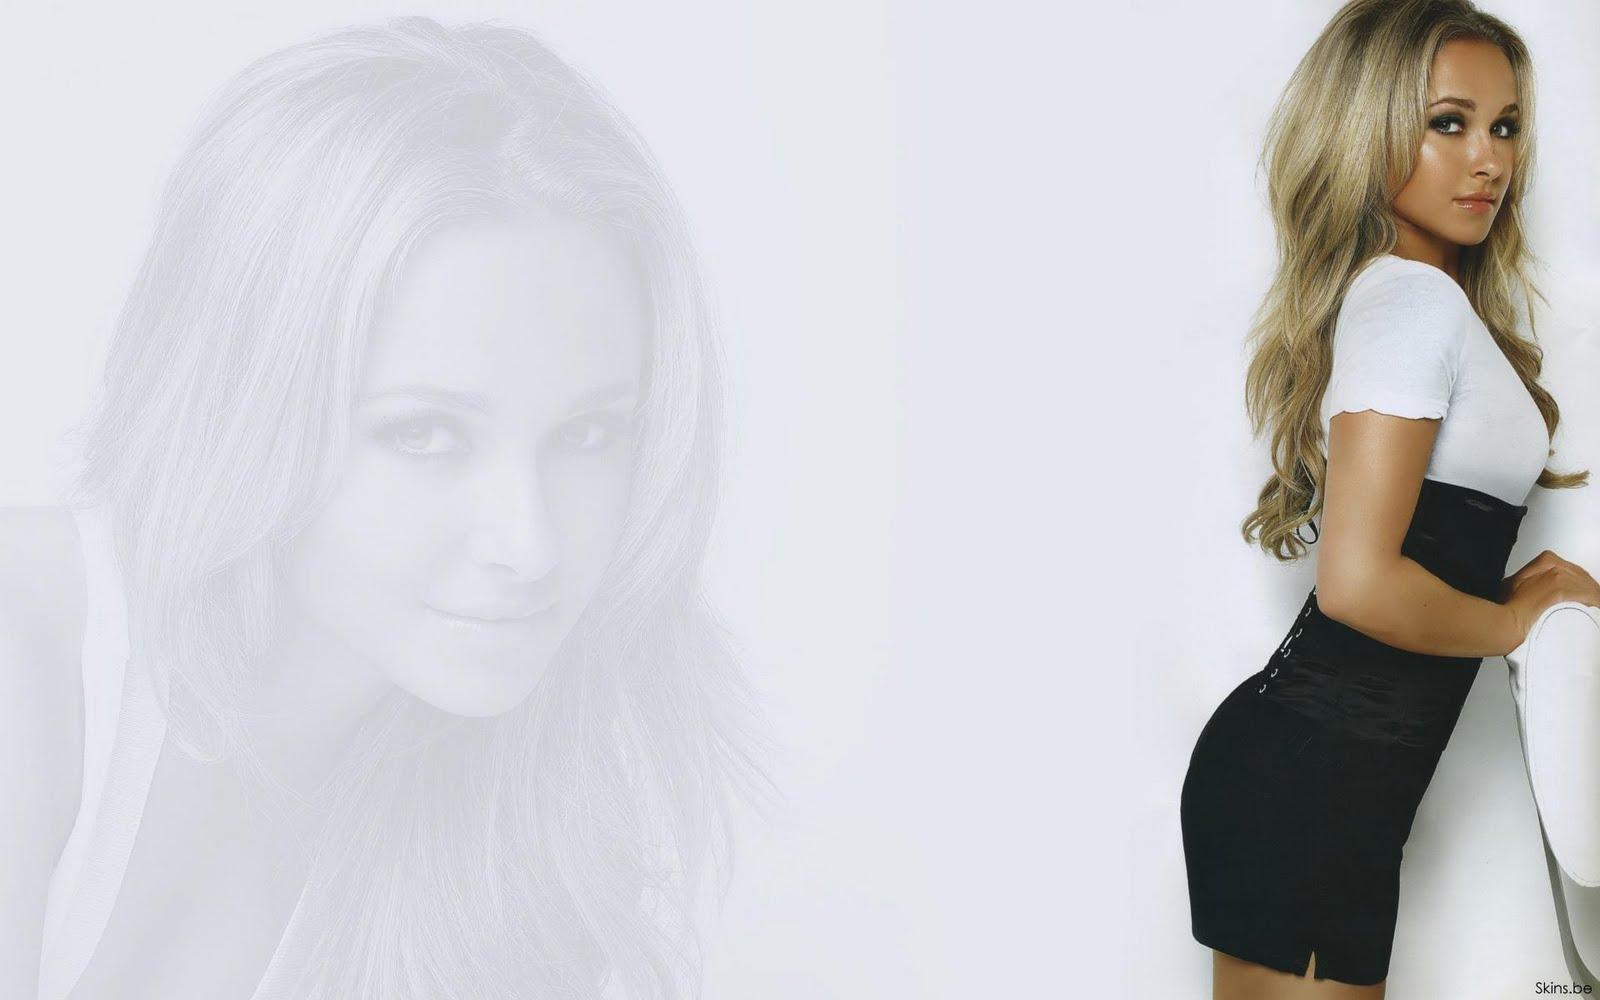 http://2.bp.blogspot.com/-CYaKuj5dRxI/Ttoq2peDA9I/AAAAAAAAJ0M/VyLRac0j2J4/s1600/Hayden_Panettiere_Cute_Girl_Wallpapers_05.jpg